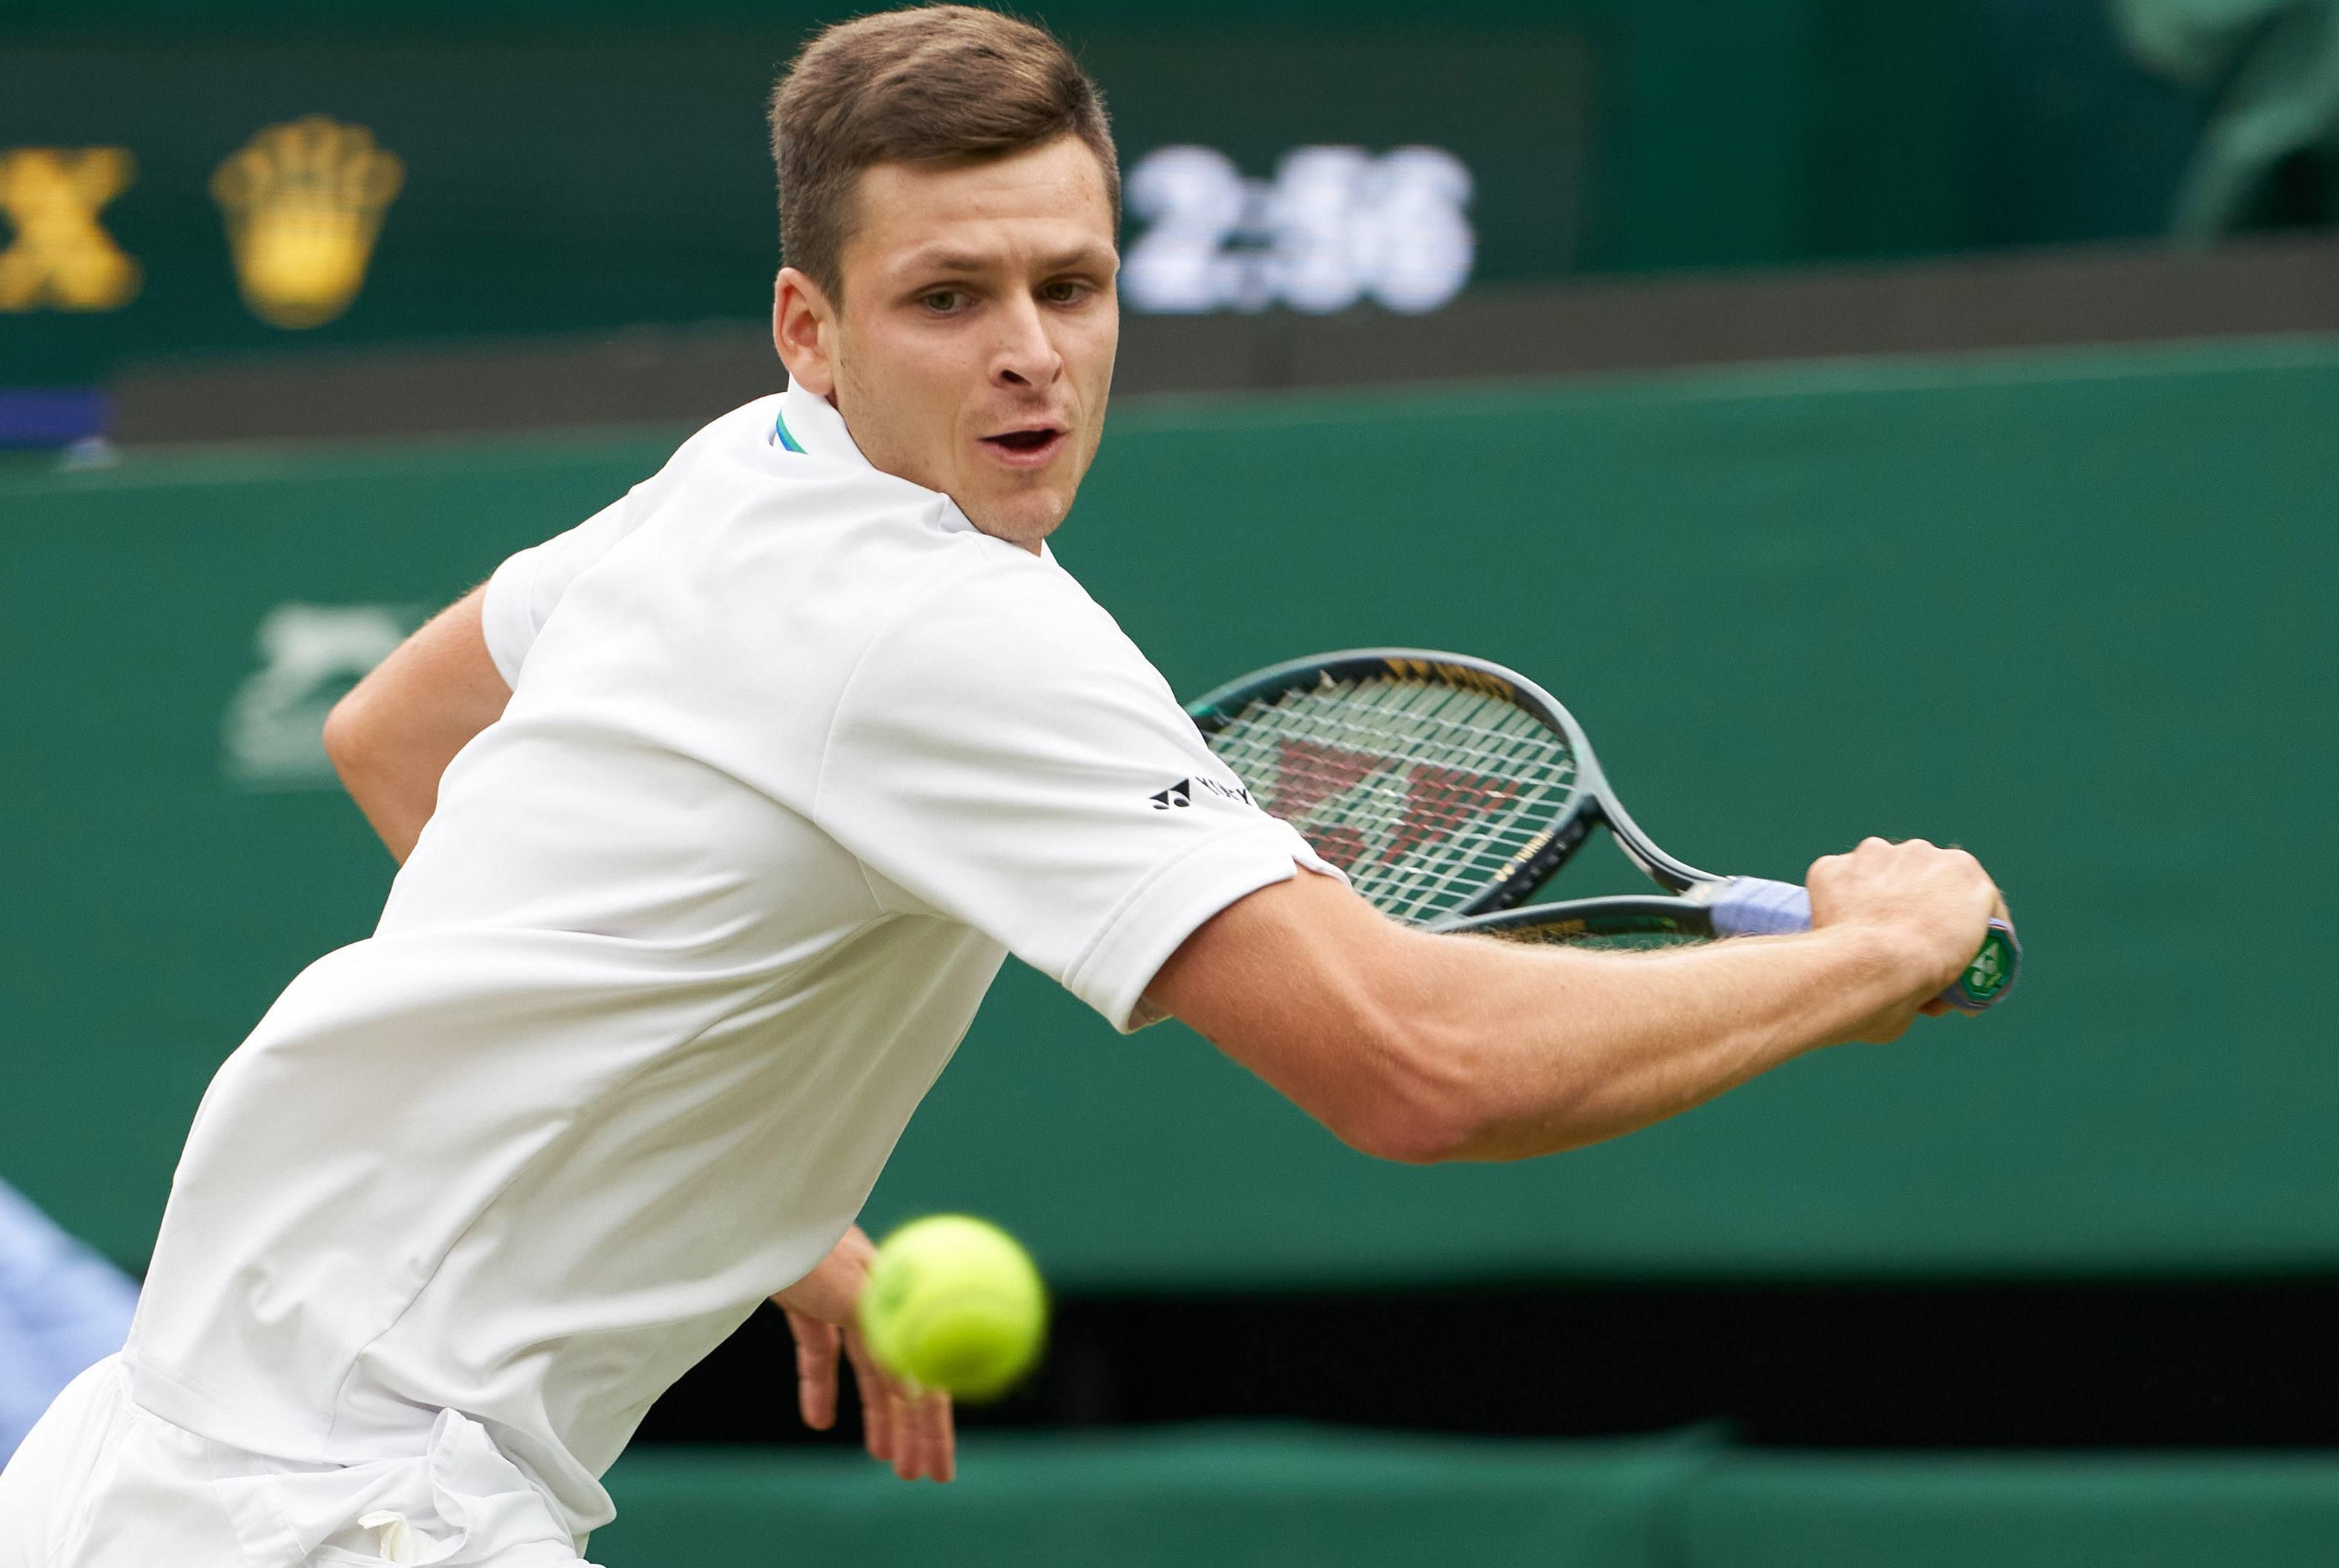 Peluang Wimbledon Federer Djokovic